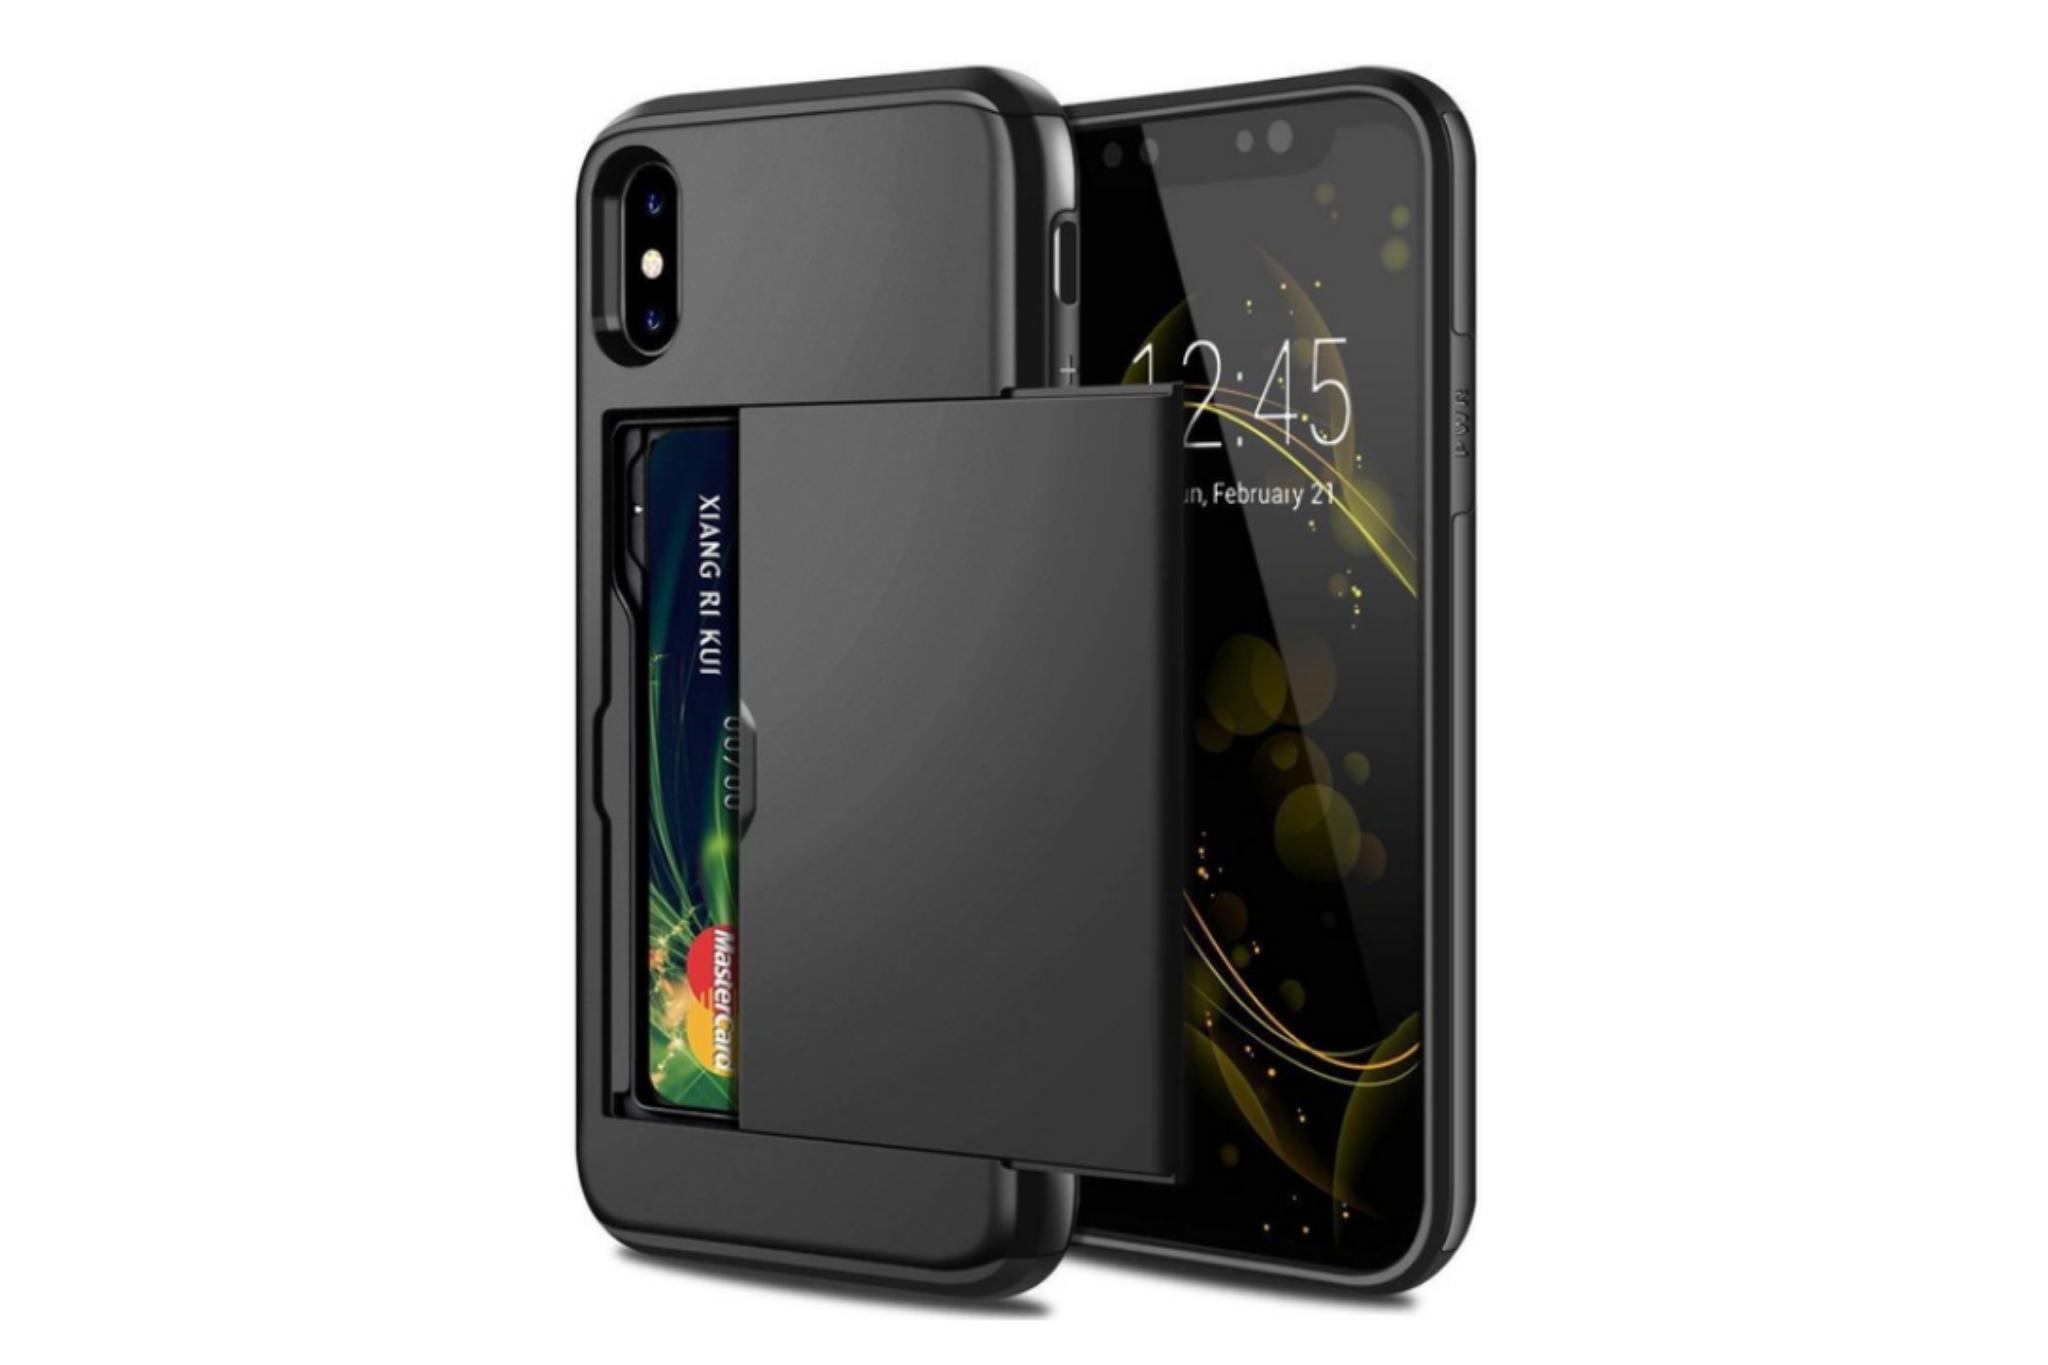 Smartphonehoesje iPhone X / XS | Pasjesschuif zwart